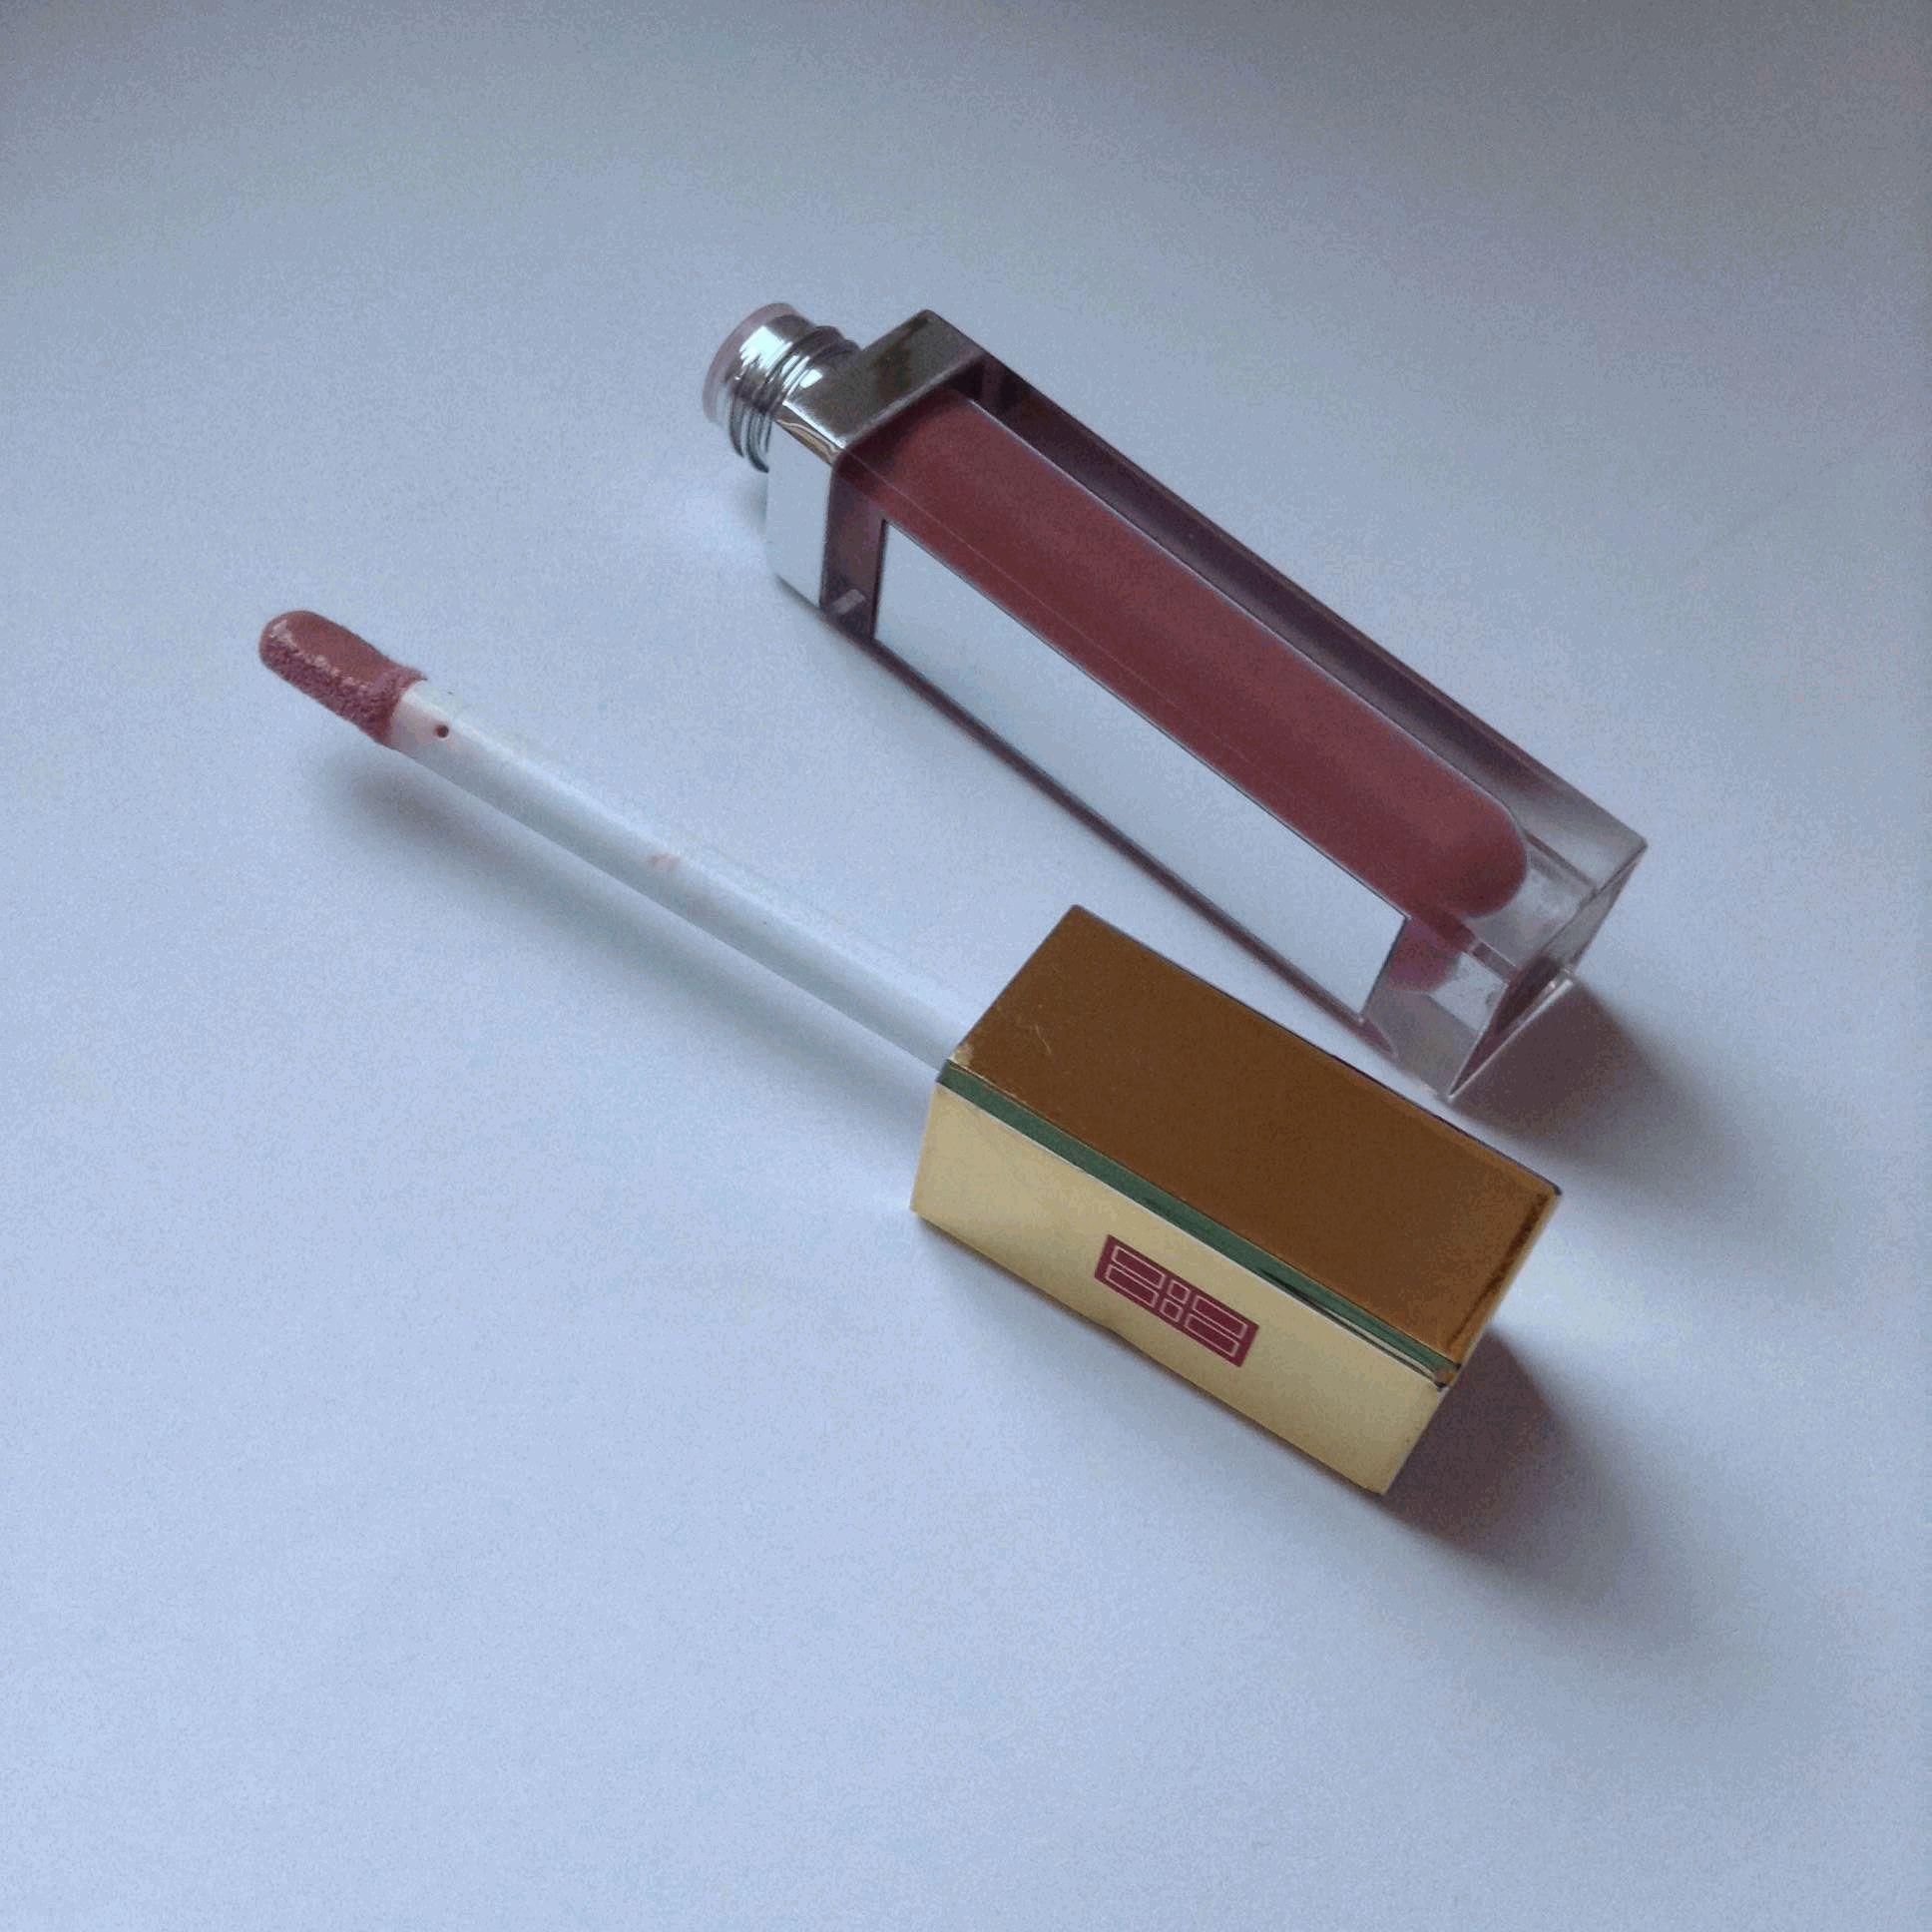 Elizabeth Arden,nude макияж,макияж,блеск для губ,dasha zoloto